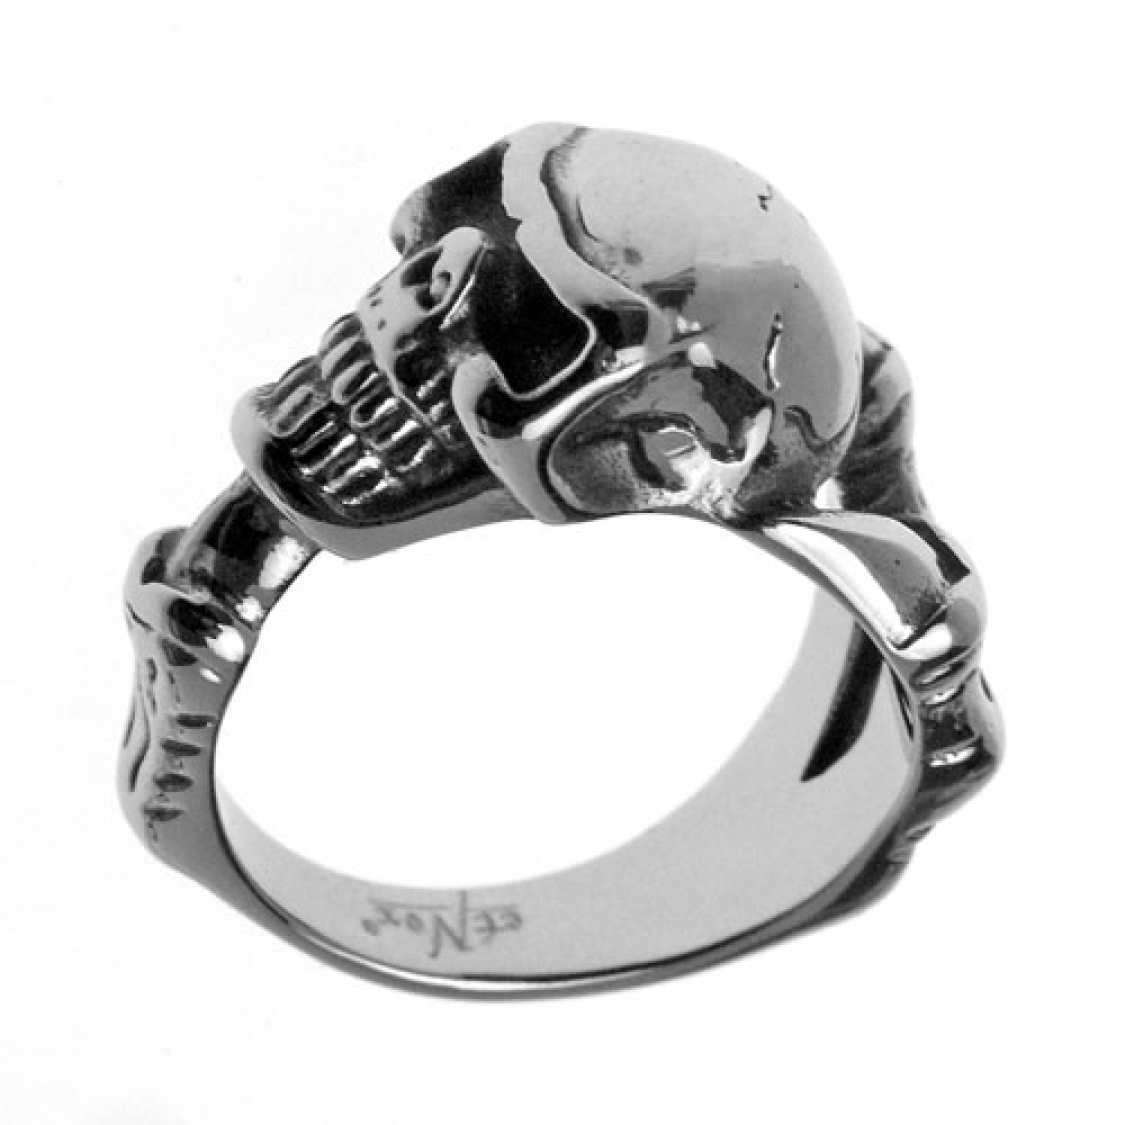 Edelstahl-Ring Drachenklaue mit Skull, Totenkopf, Dragon claw